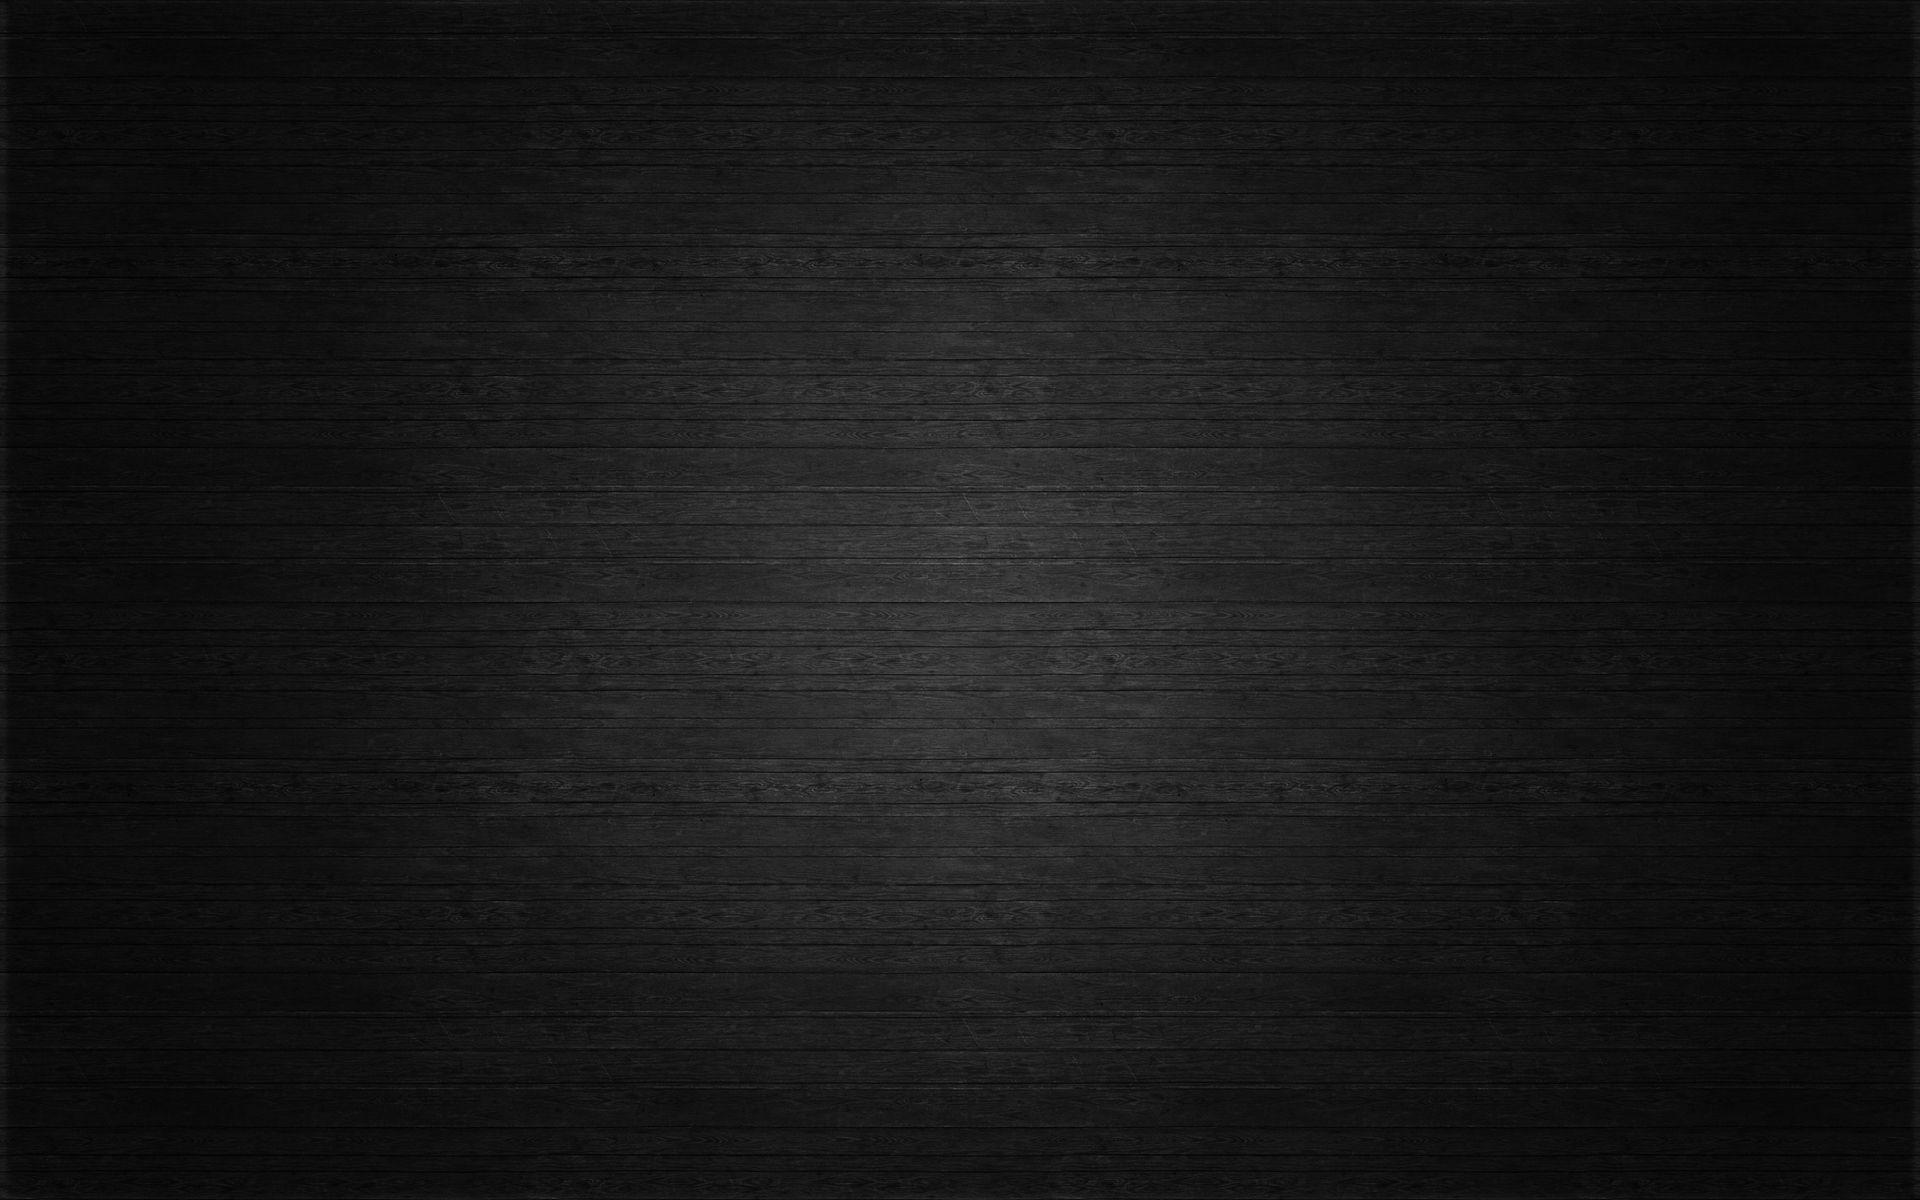 Popular Wallpaper Minecraft Dark - 7dd232a232c08539957da470e4ff44f9  Gallery_97759.jpg